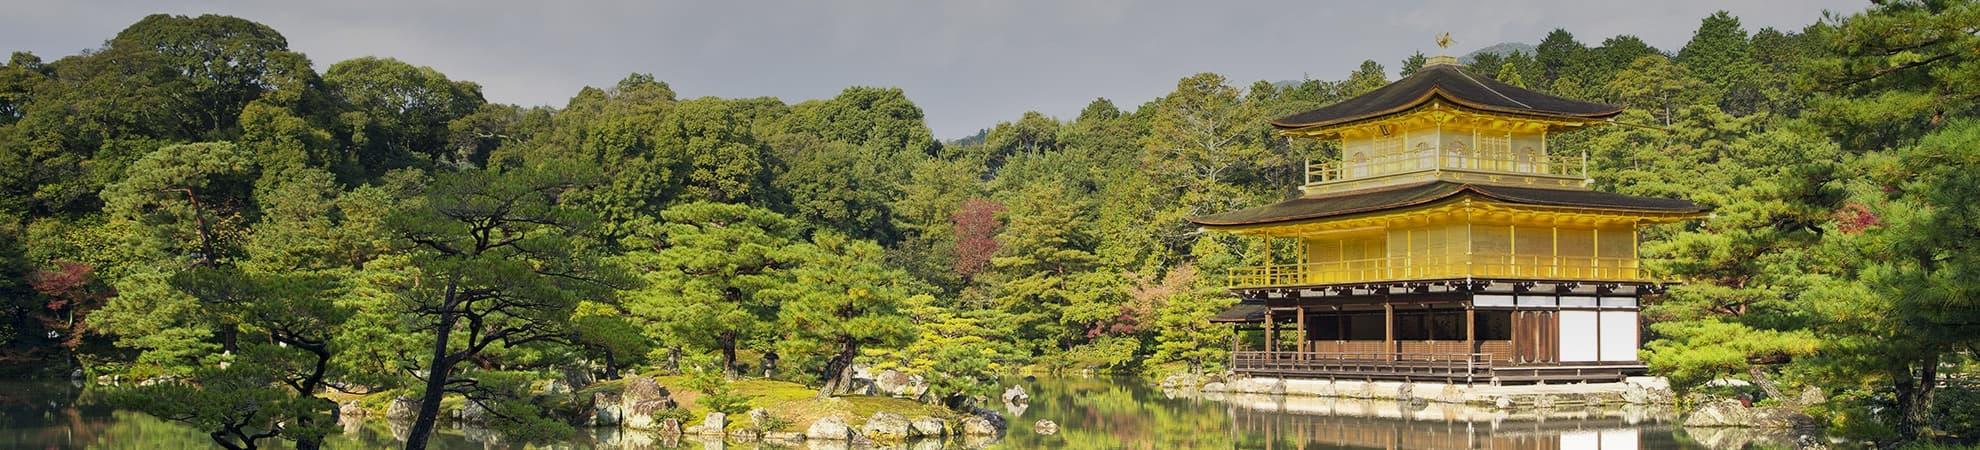 Voyage Honshu au Japon